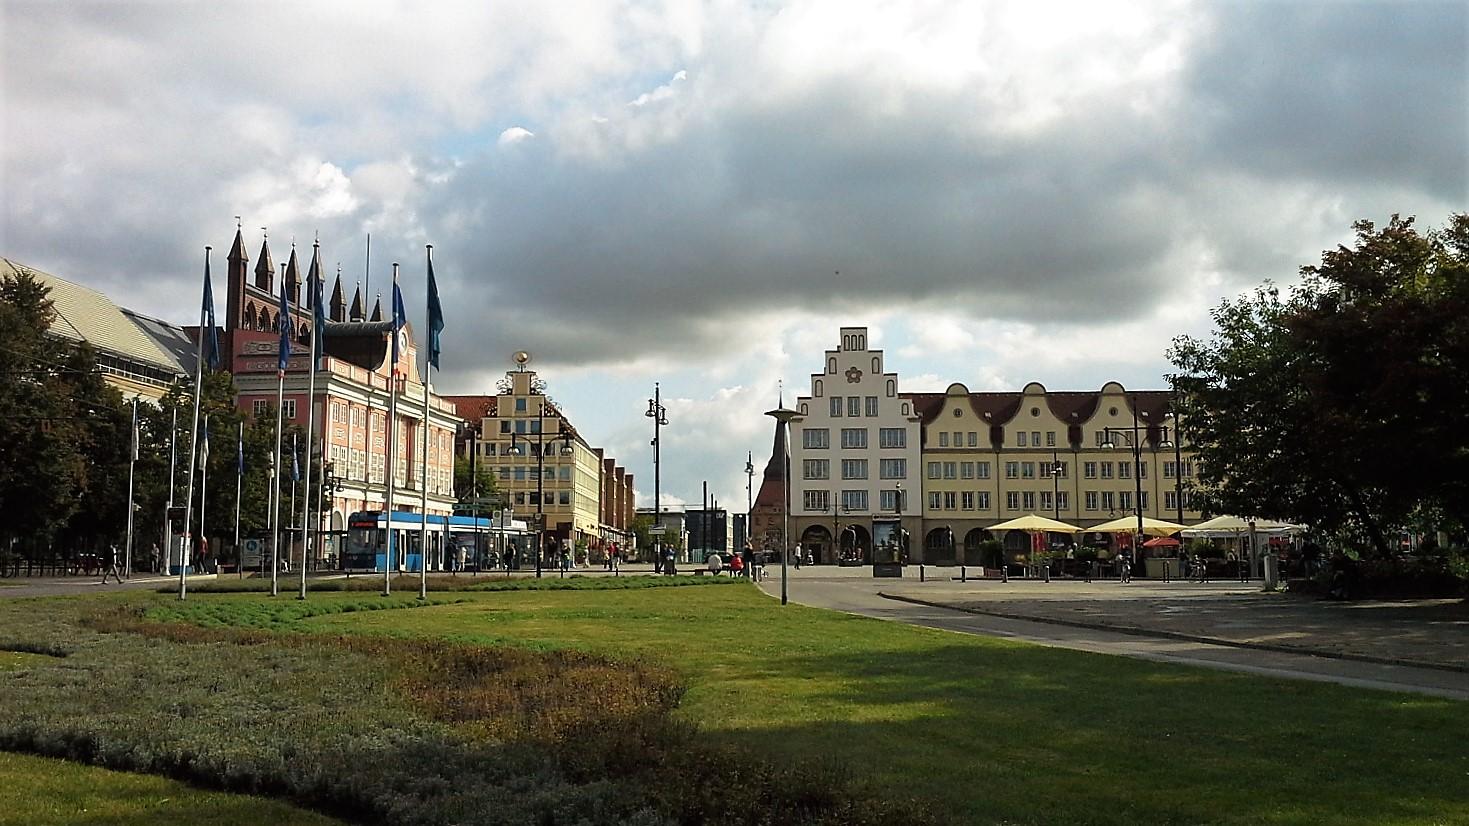 Neuermarkt Rostock